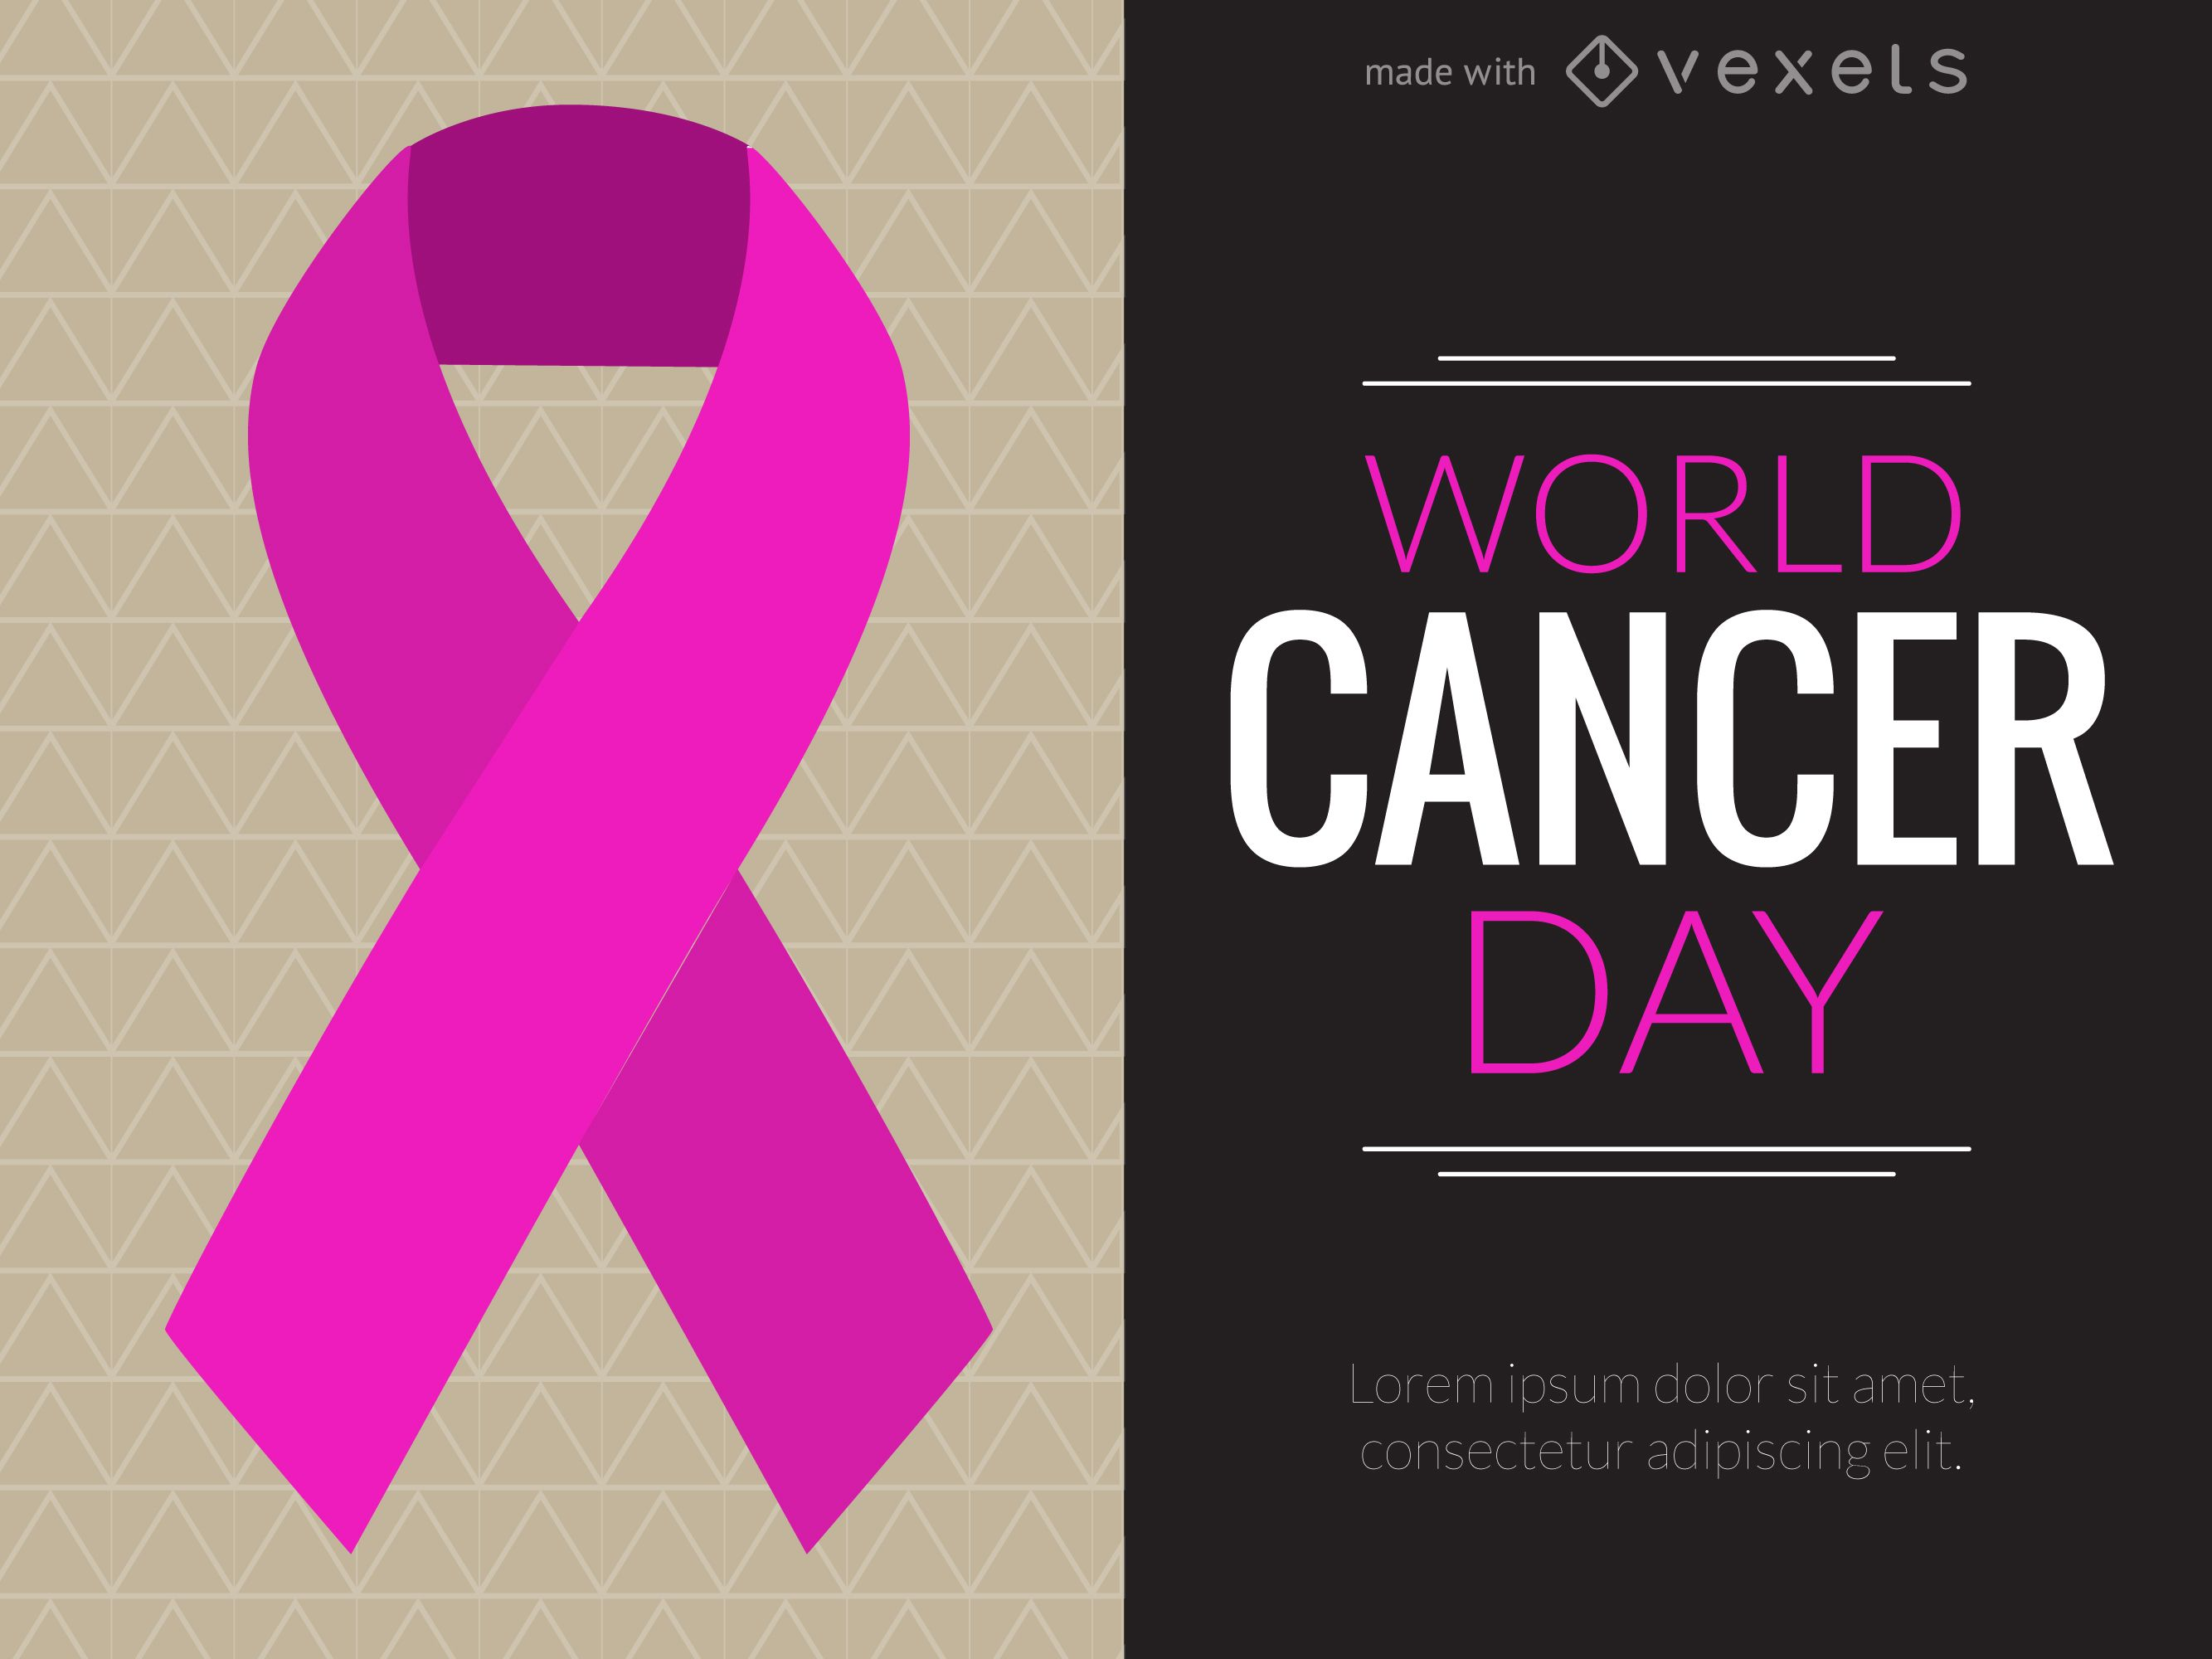 World Cancer Day design maker